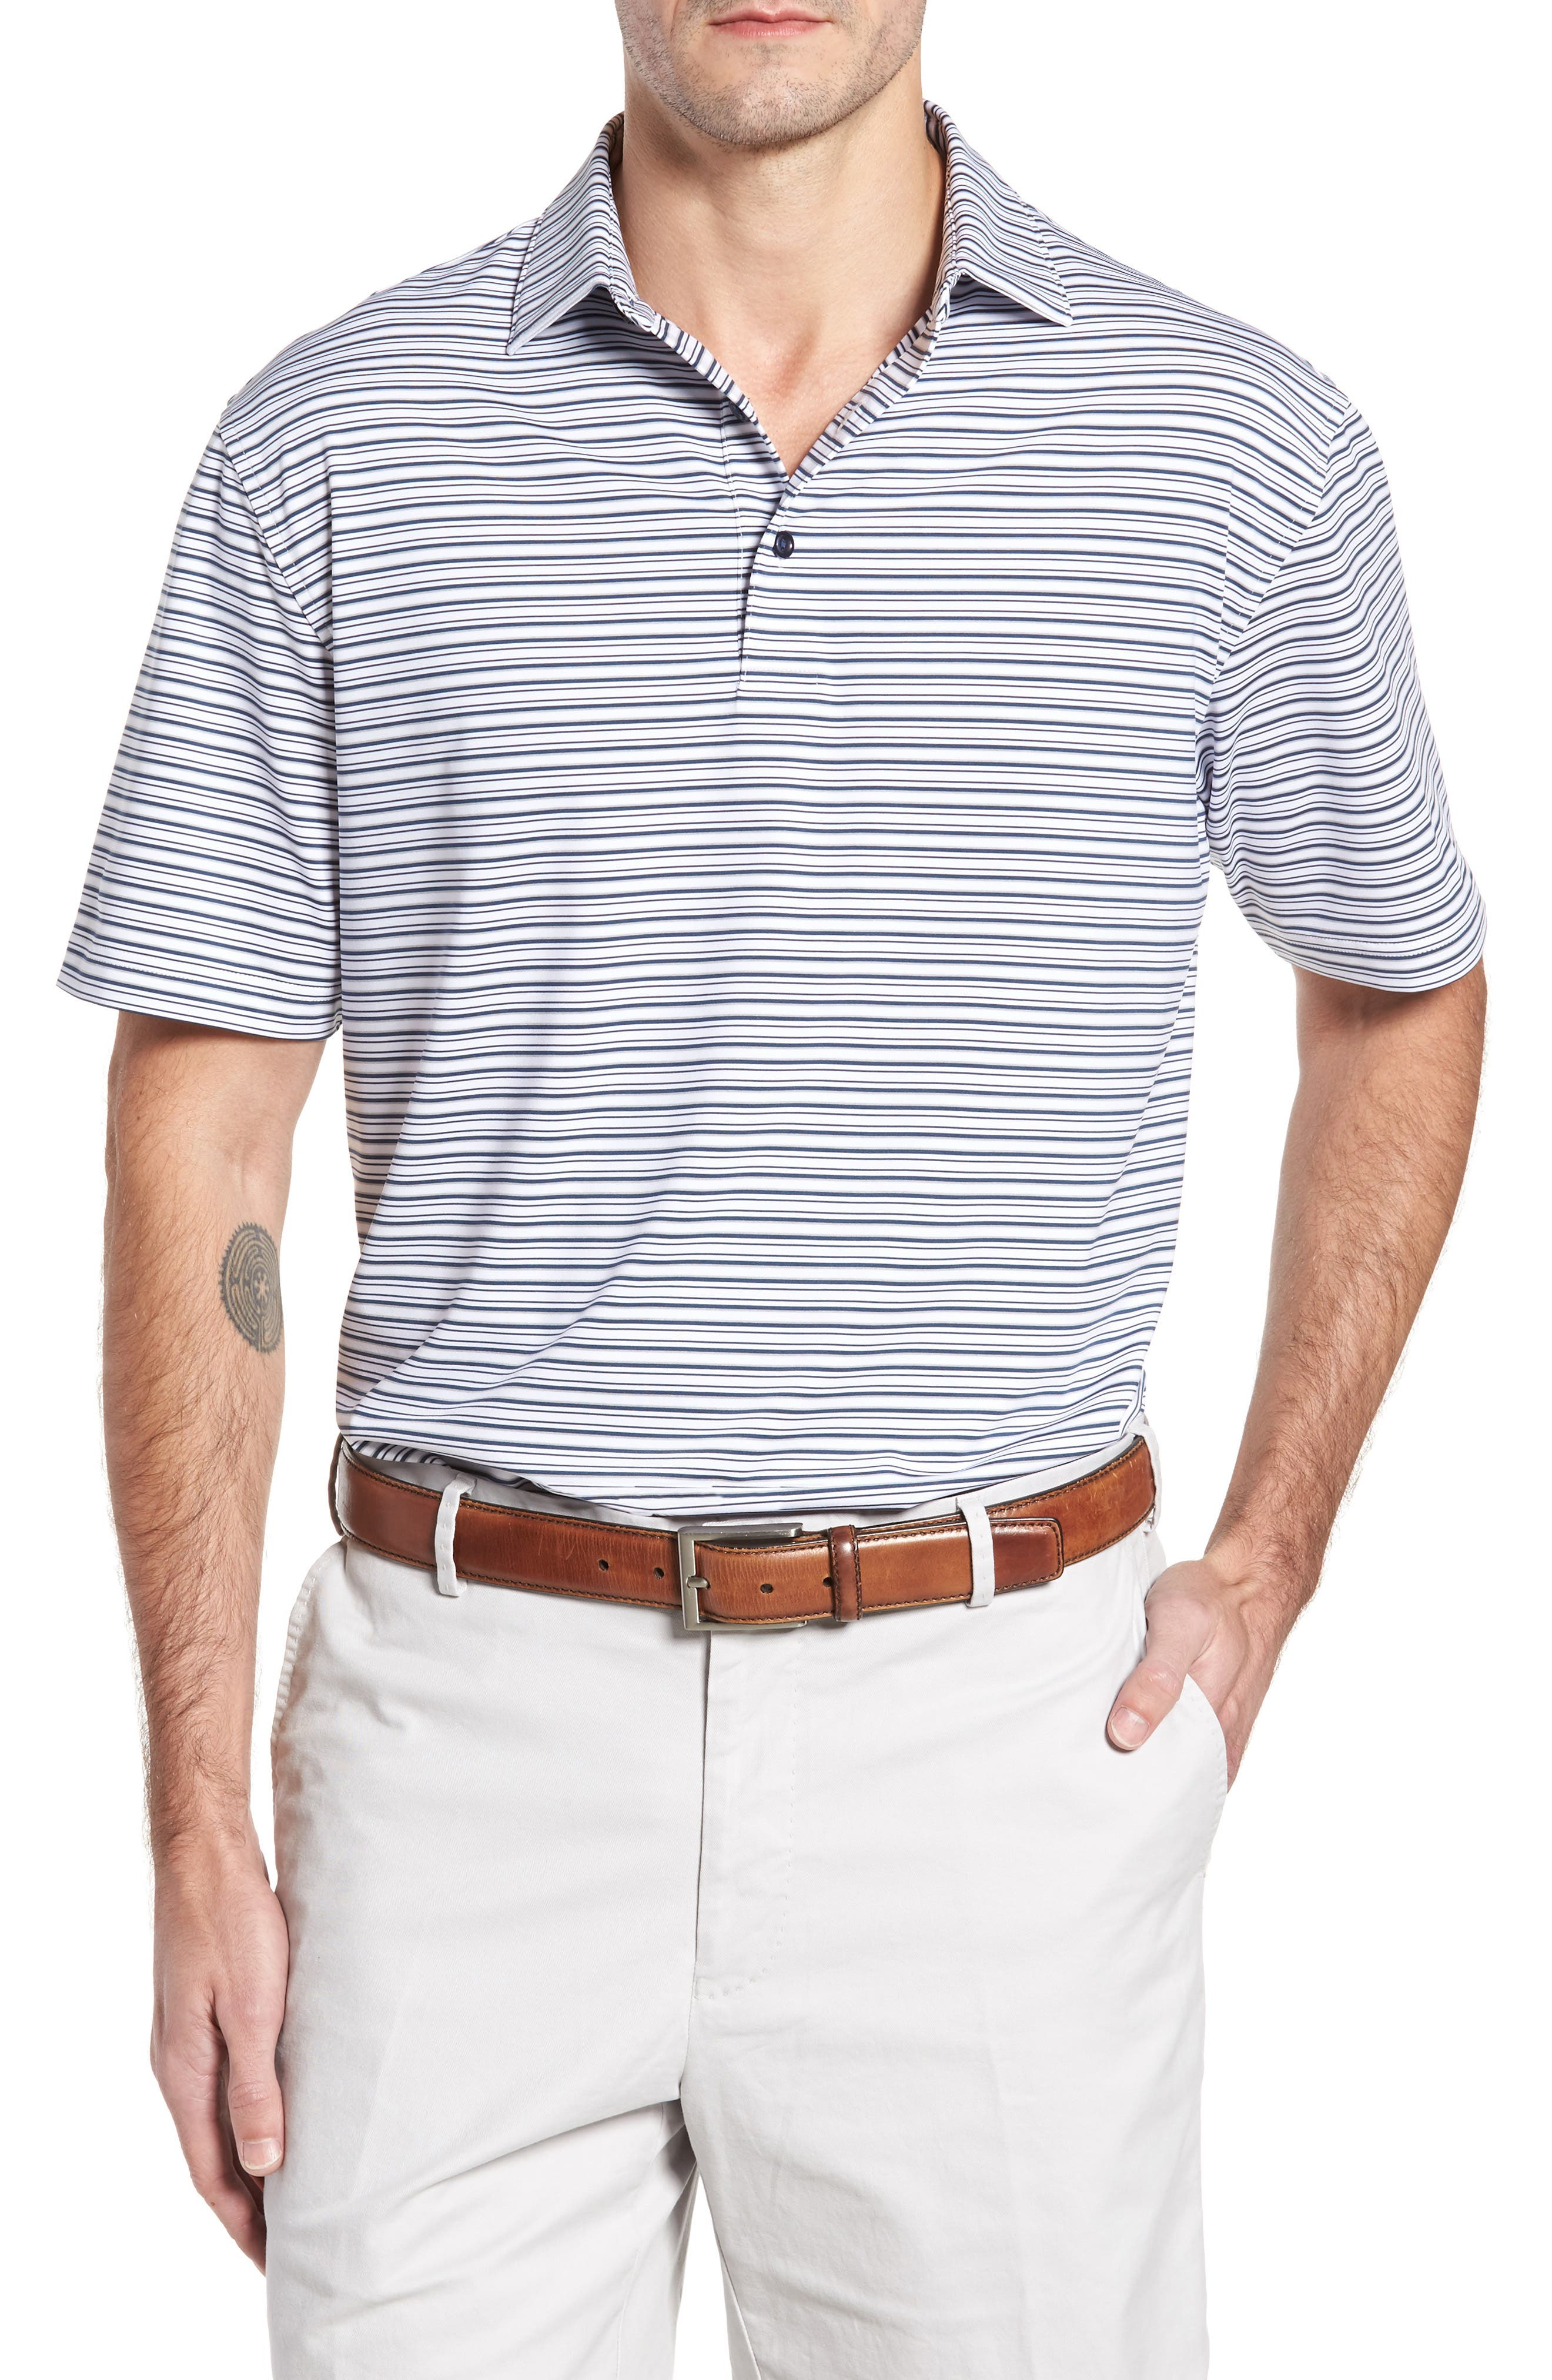 Alternate Image 1 Selected - Peter Millar Barron Sean Stripe Jersey Polo